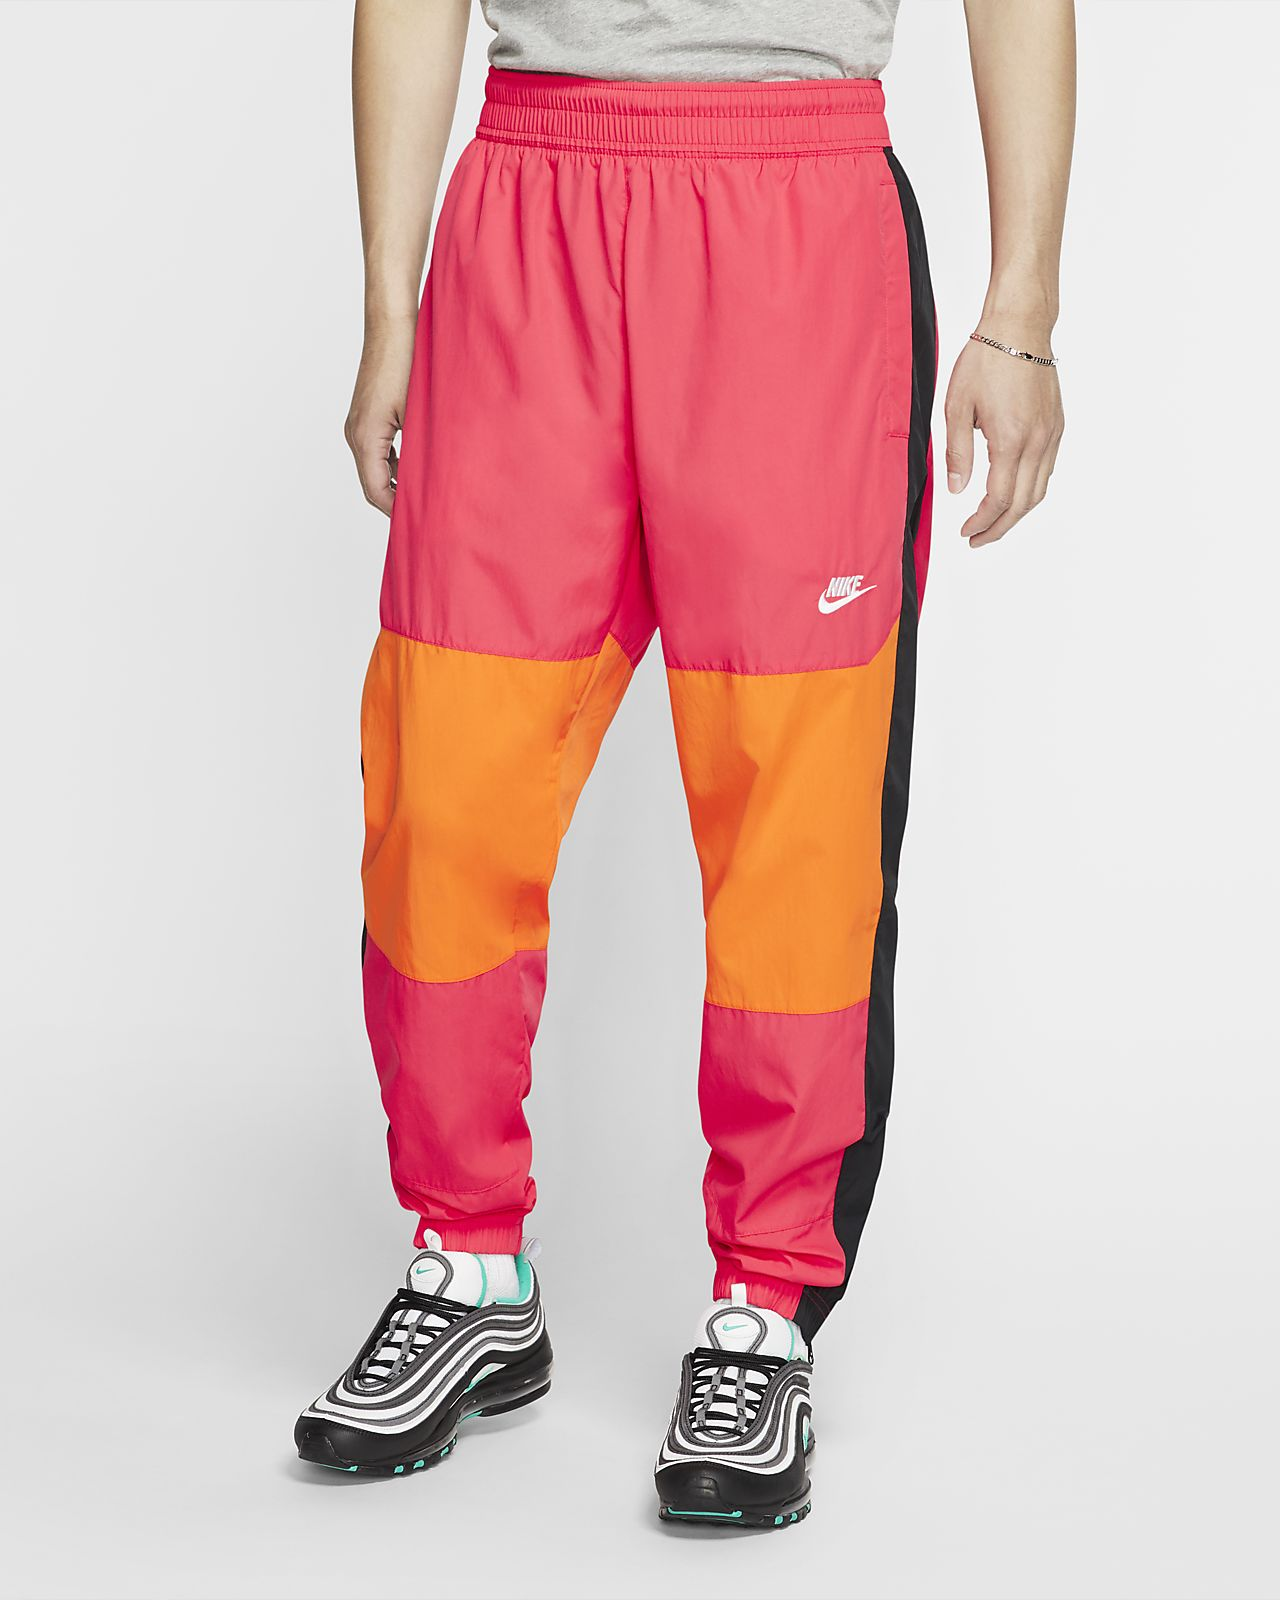 Pantalones tejidos Nike Sportswear